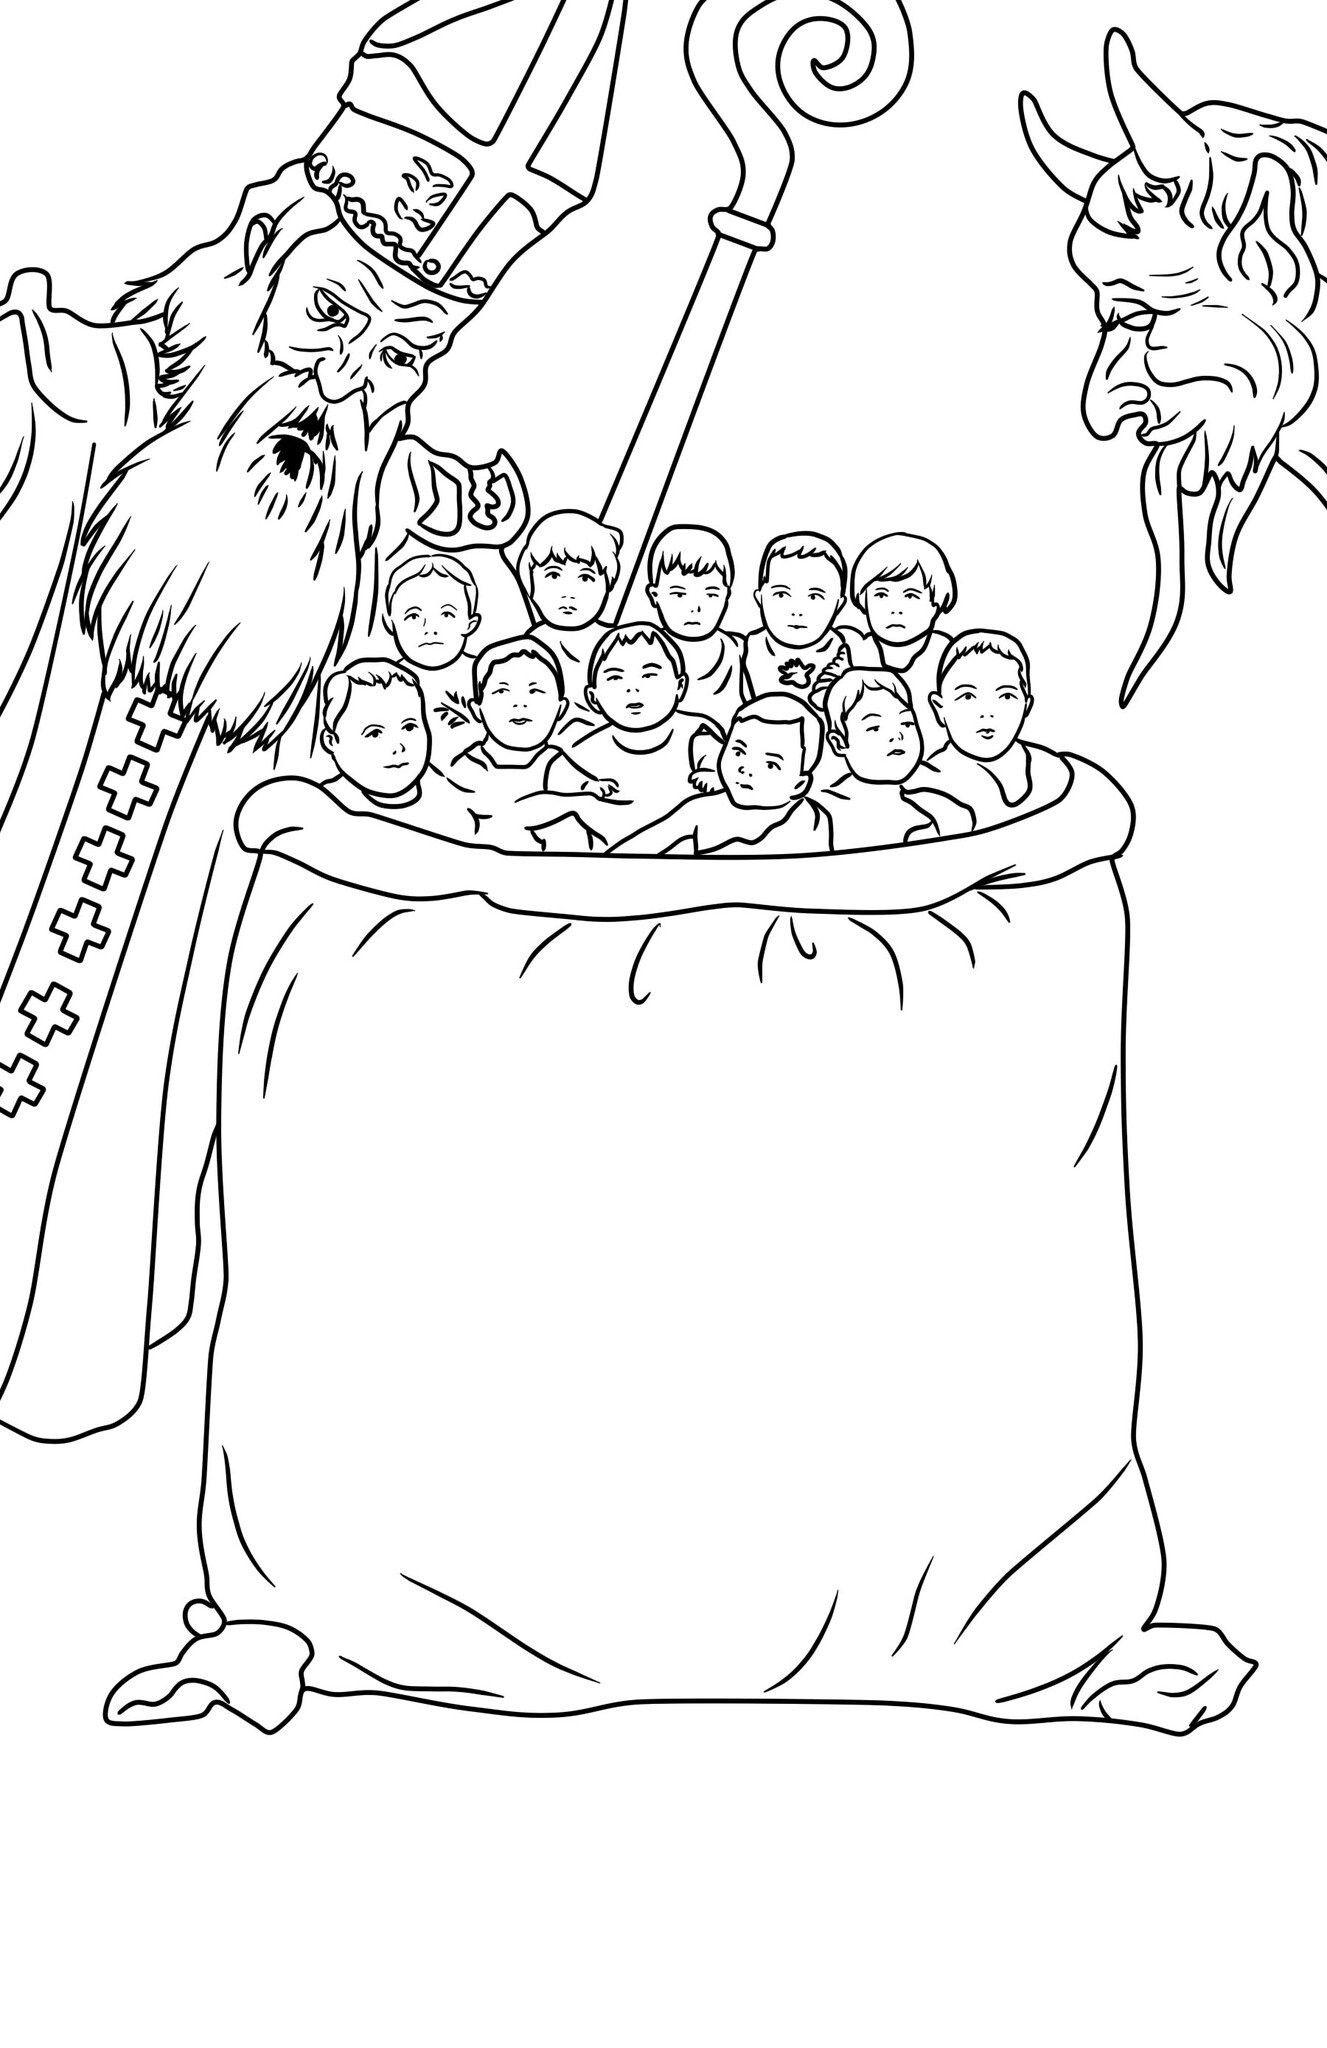 Krampus Christmas Fairytale  Krampus, Halloween coloring pages